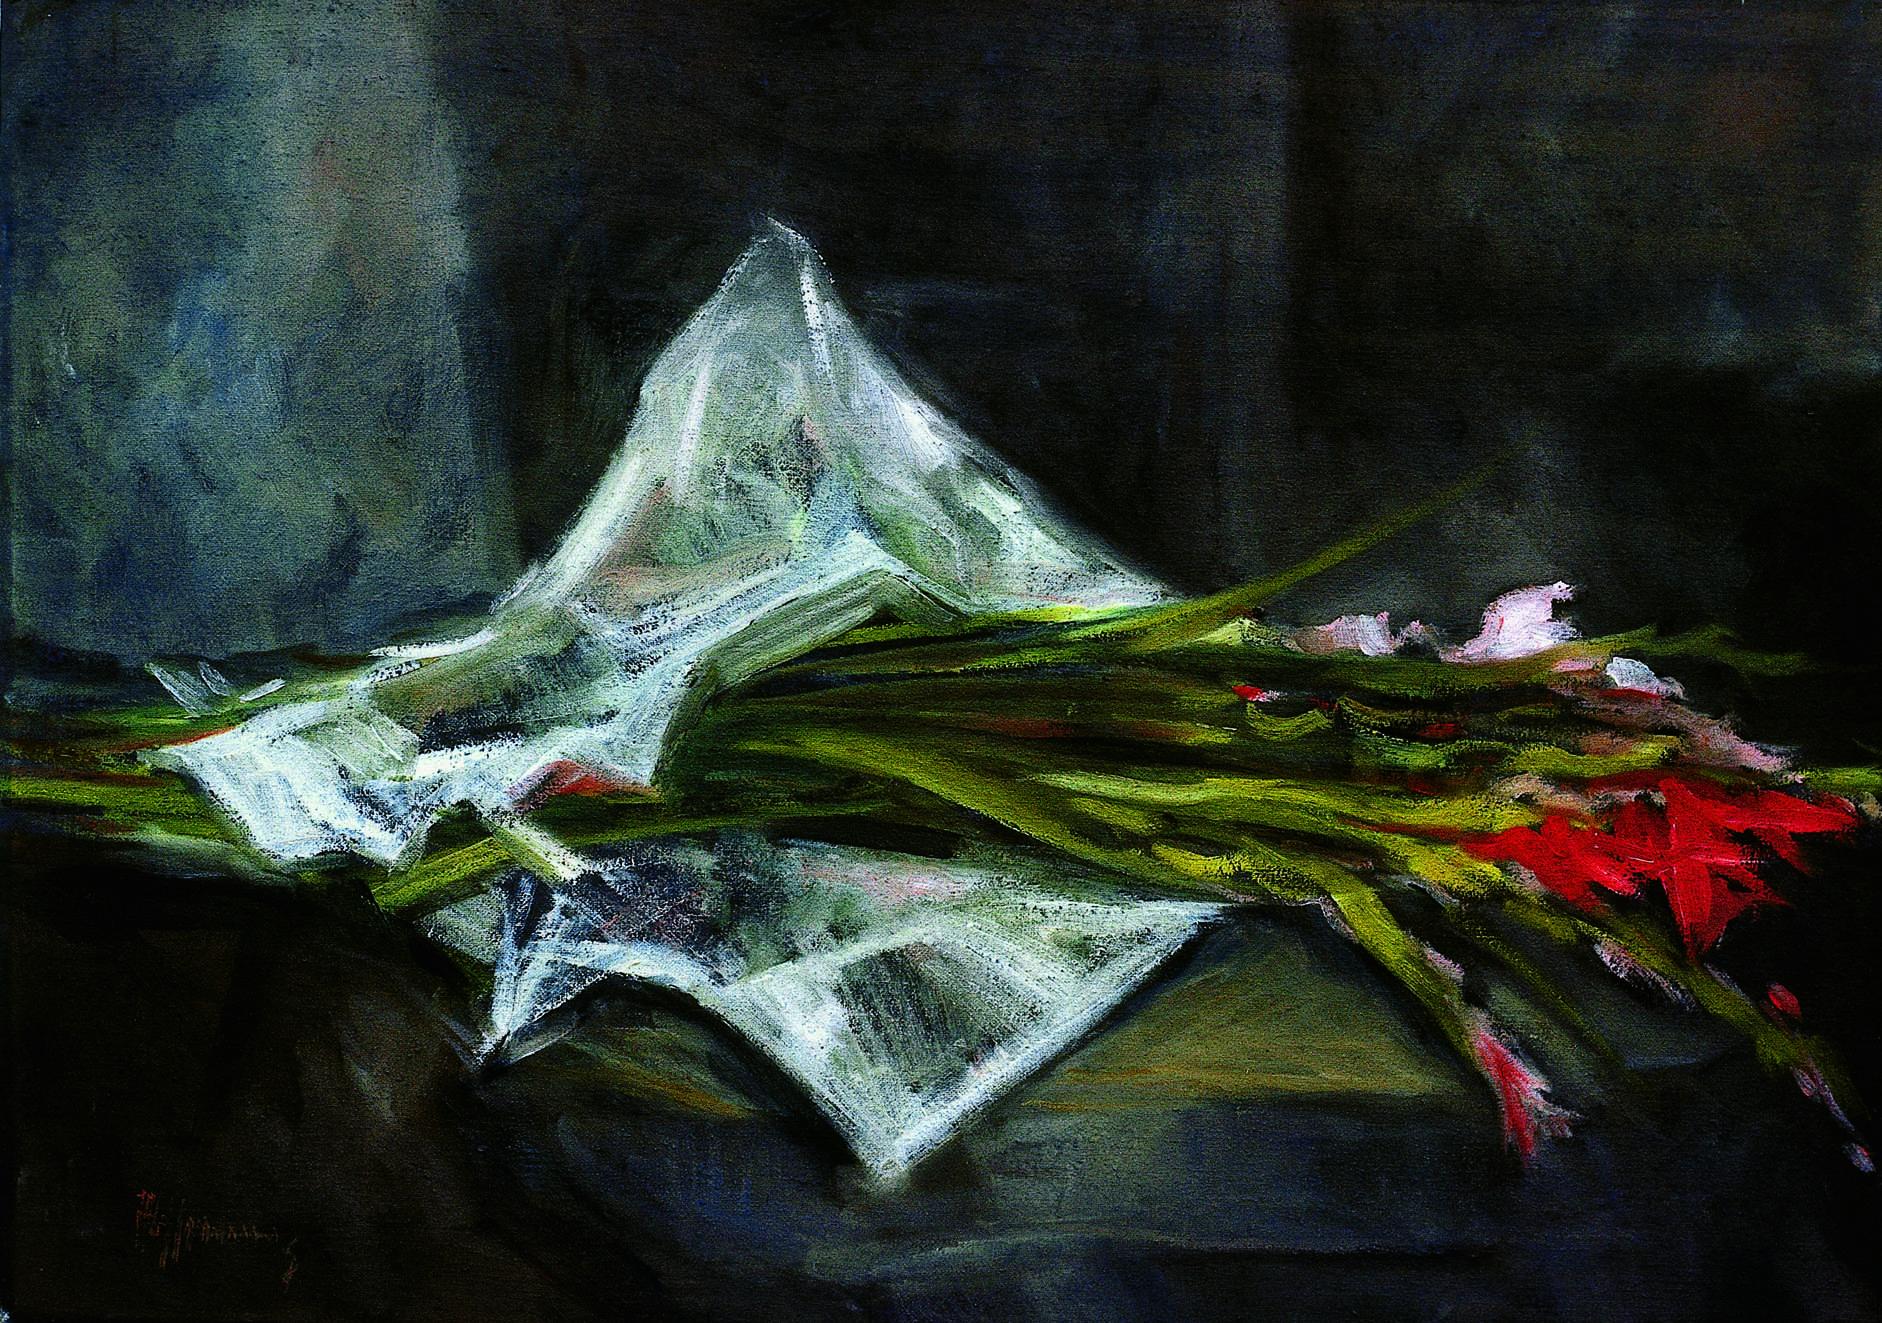 Gladiola